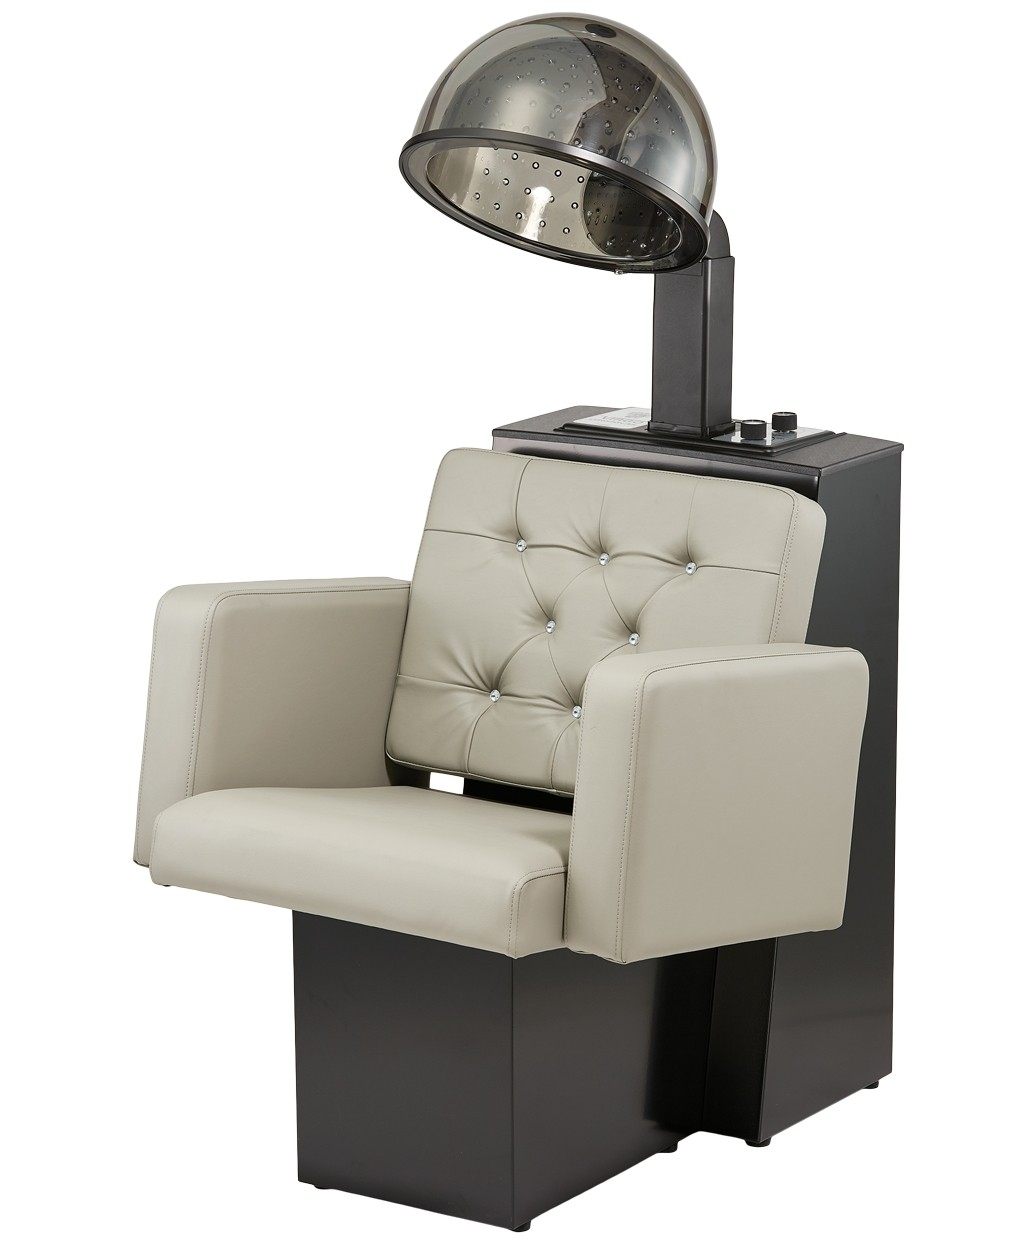 Pibbs 2269 Fondi Dryer Chair